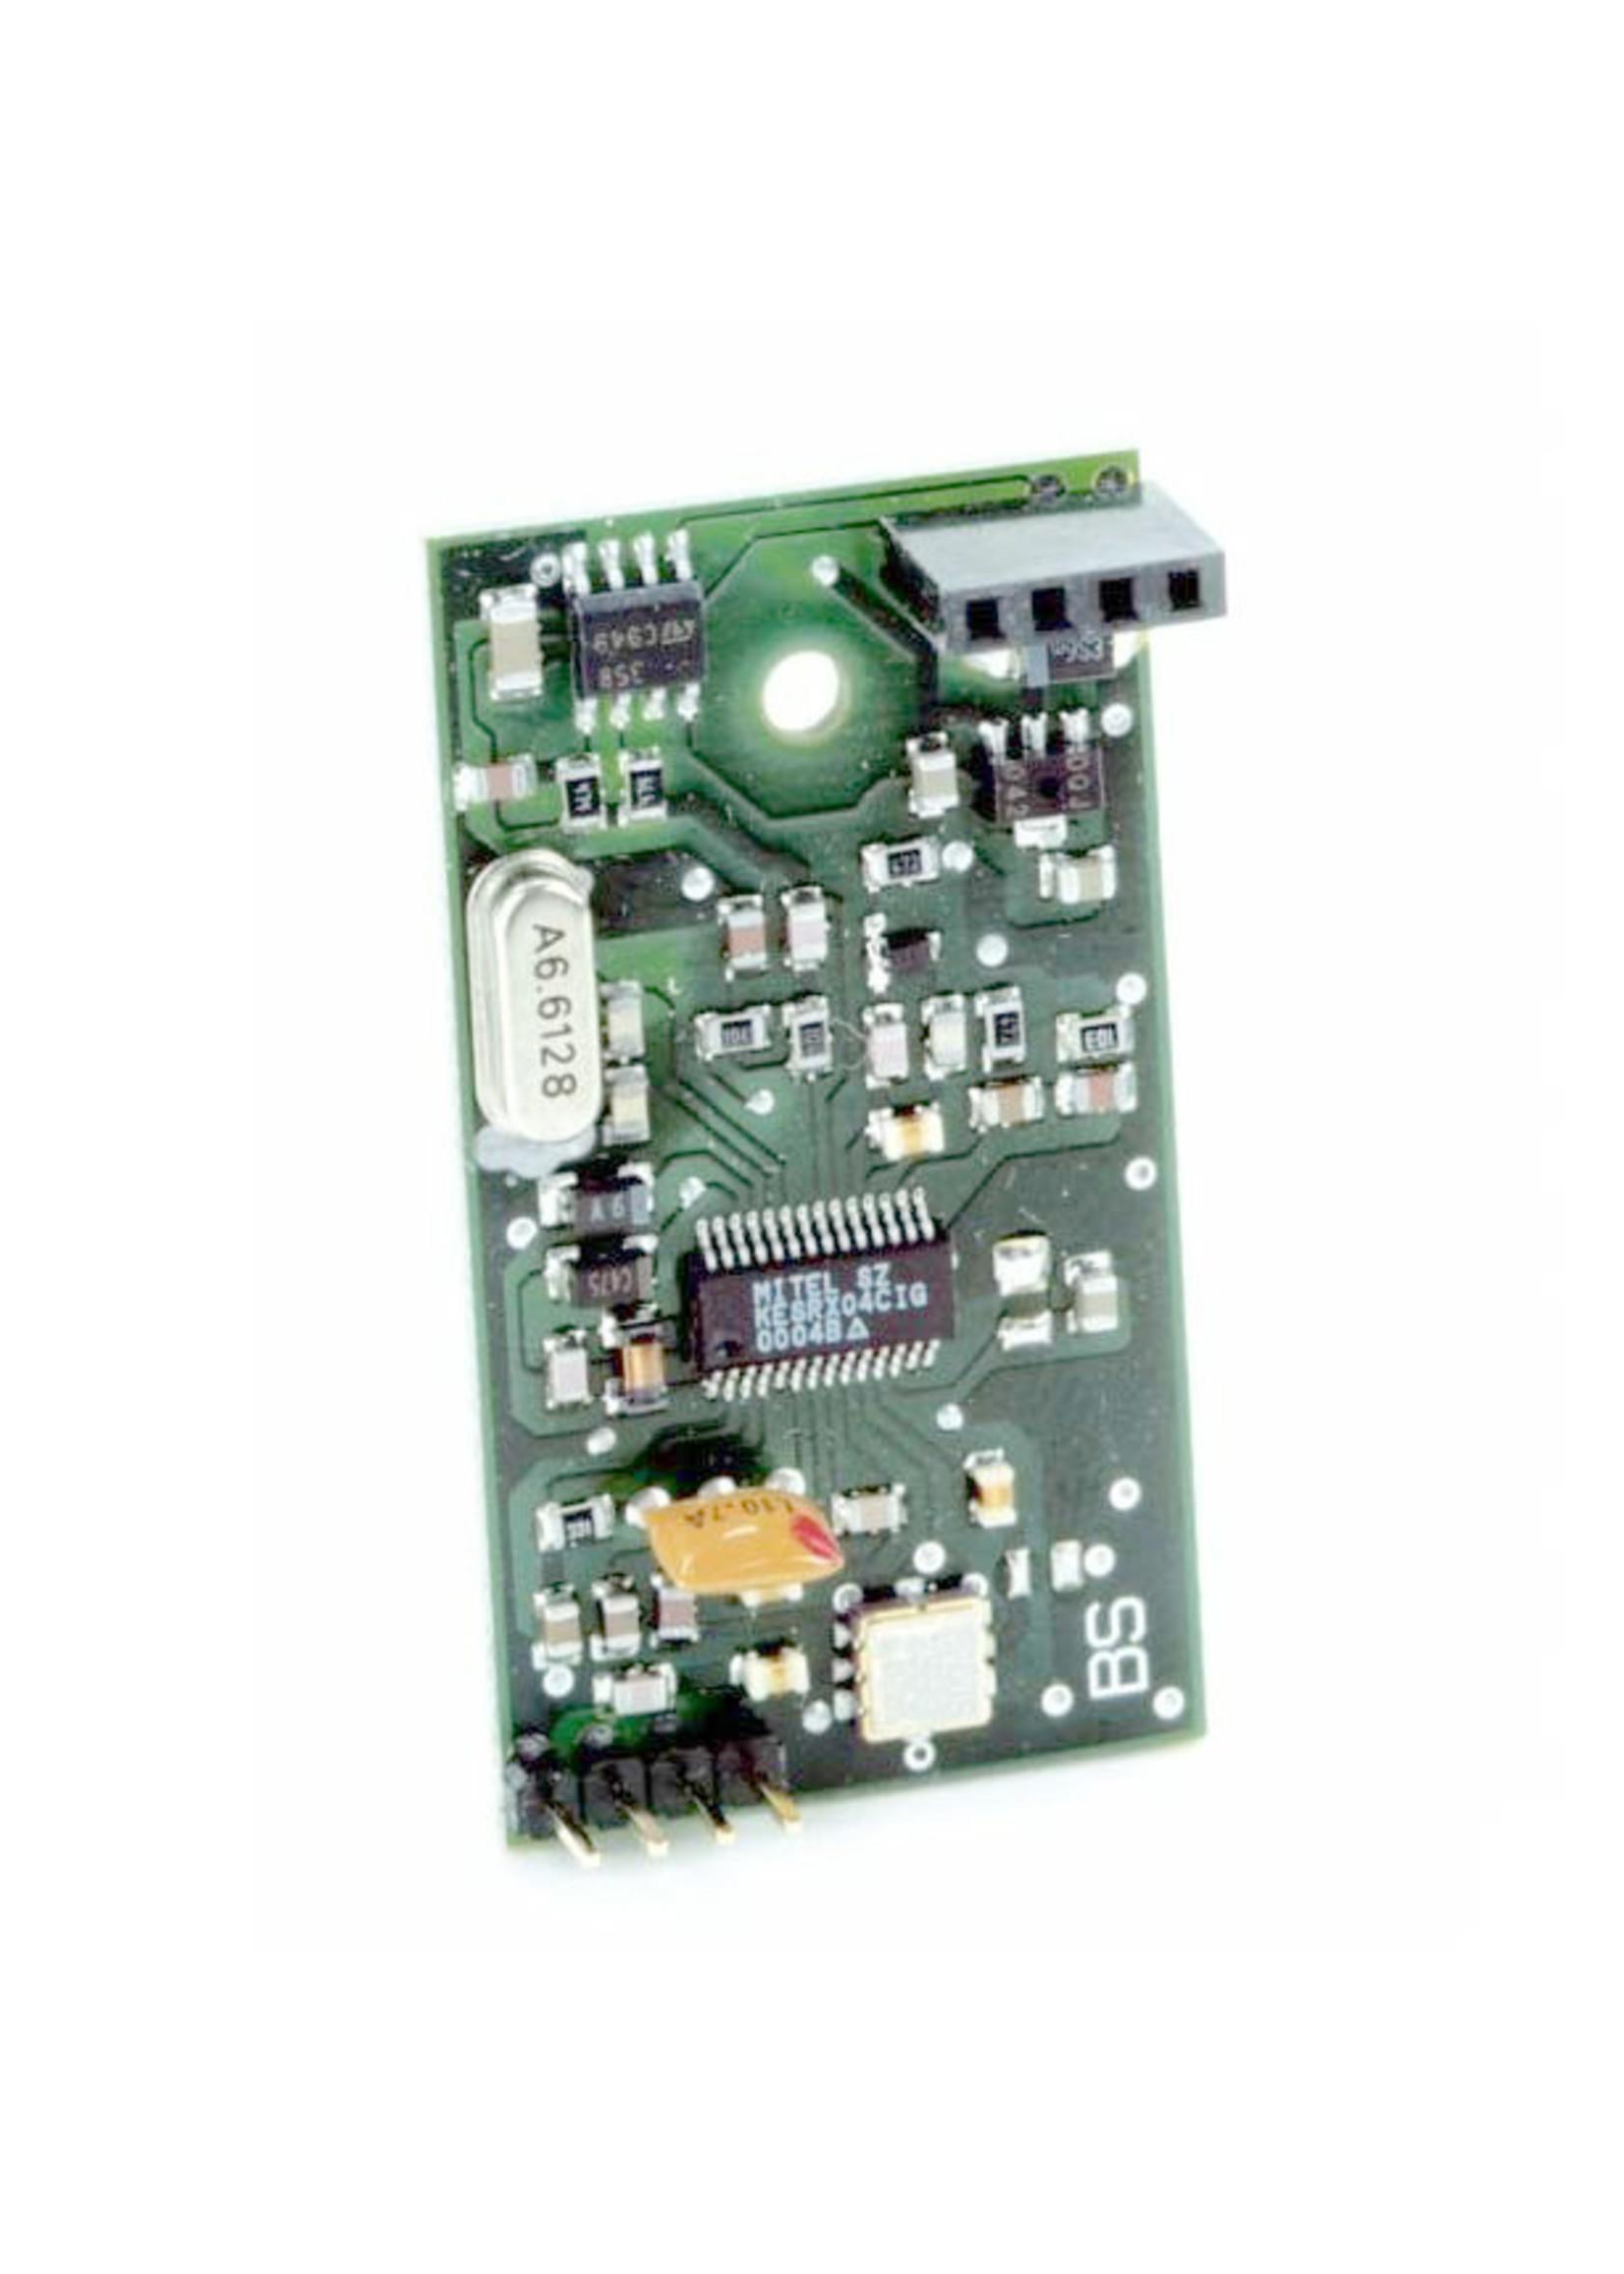 Liftmaster 041A5456B Ontvangst module insteek 801221